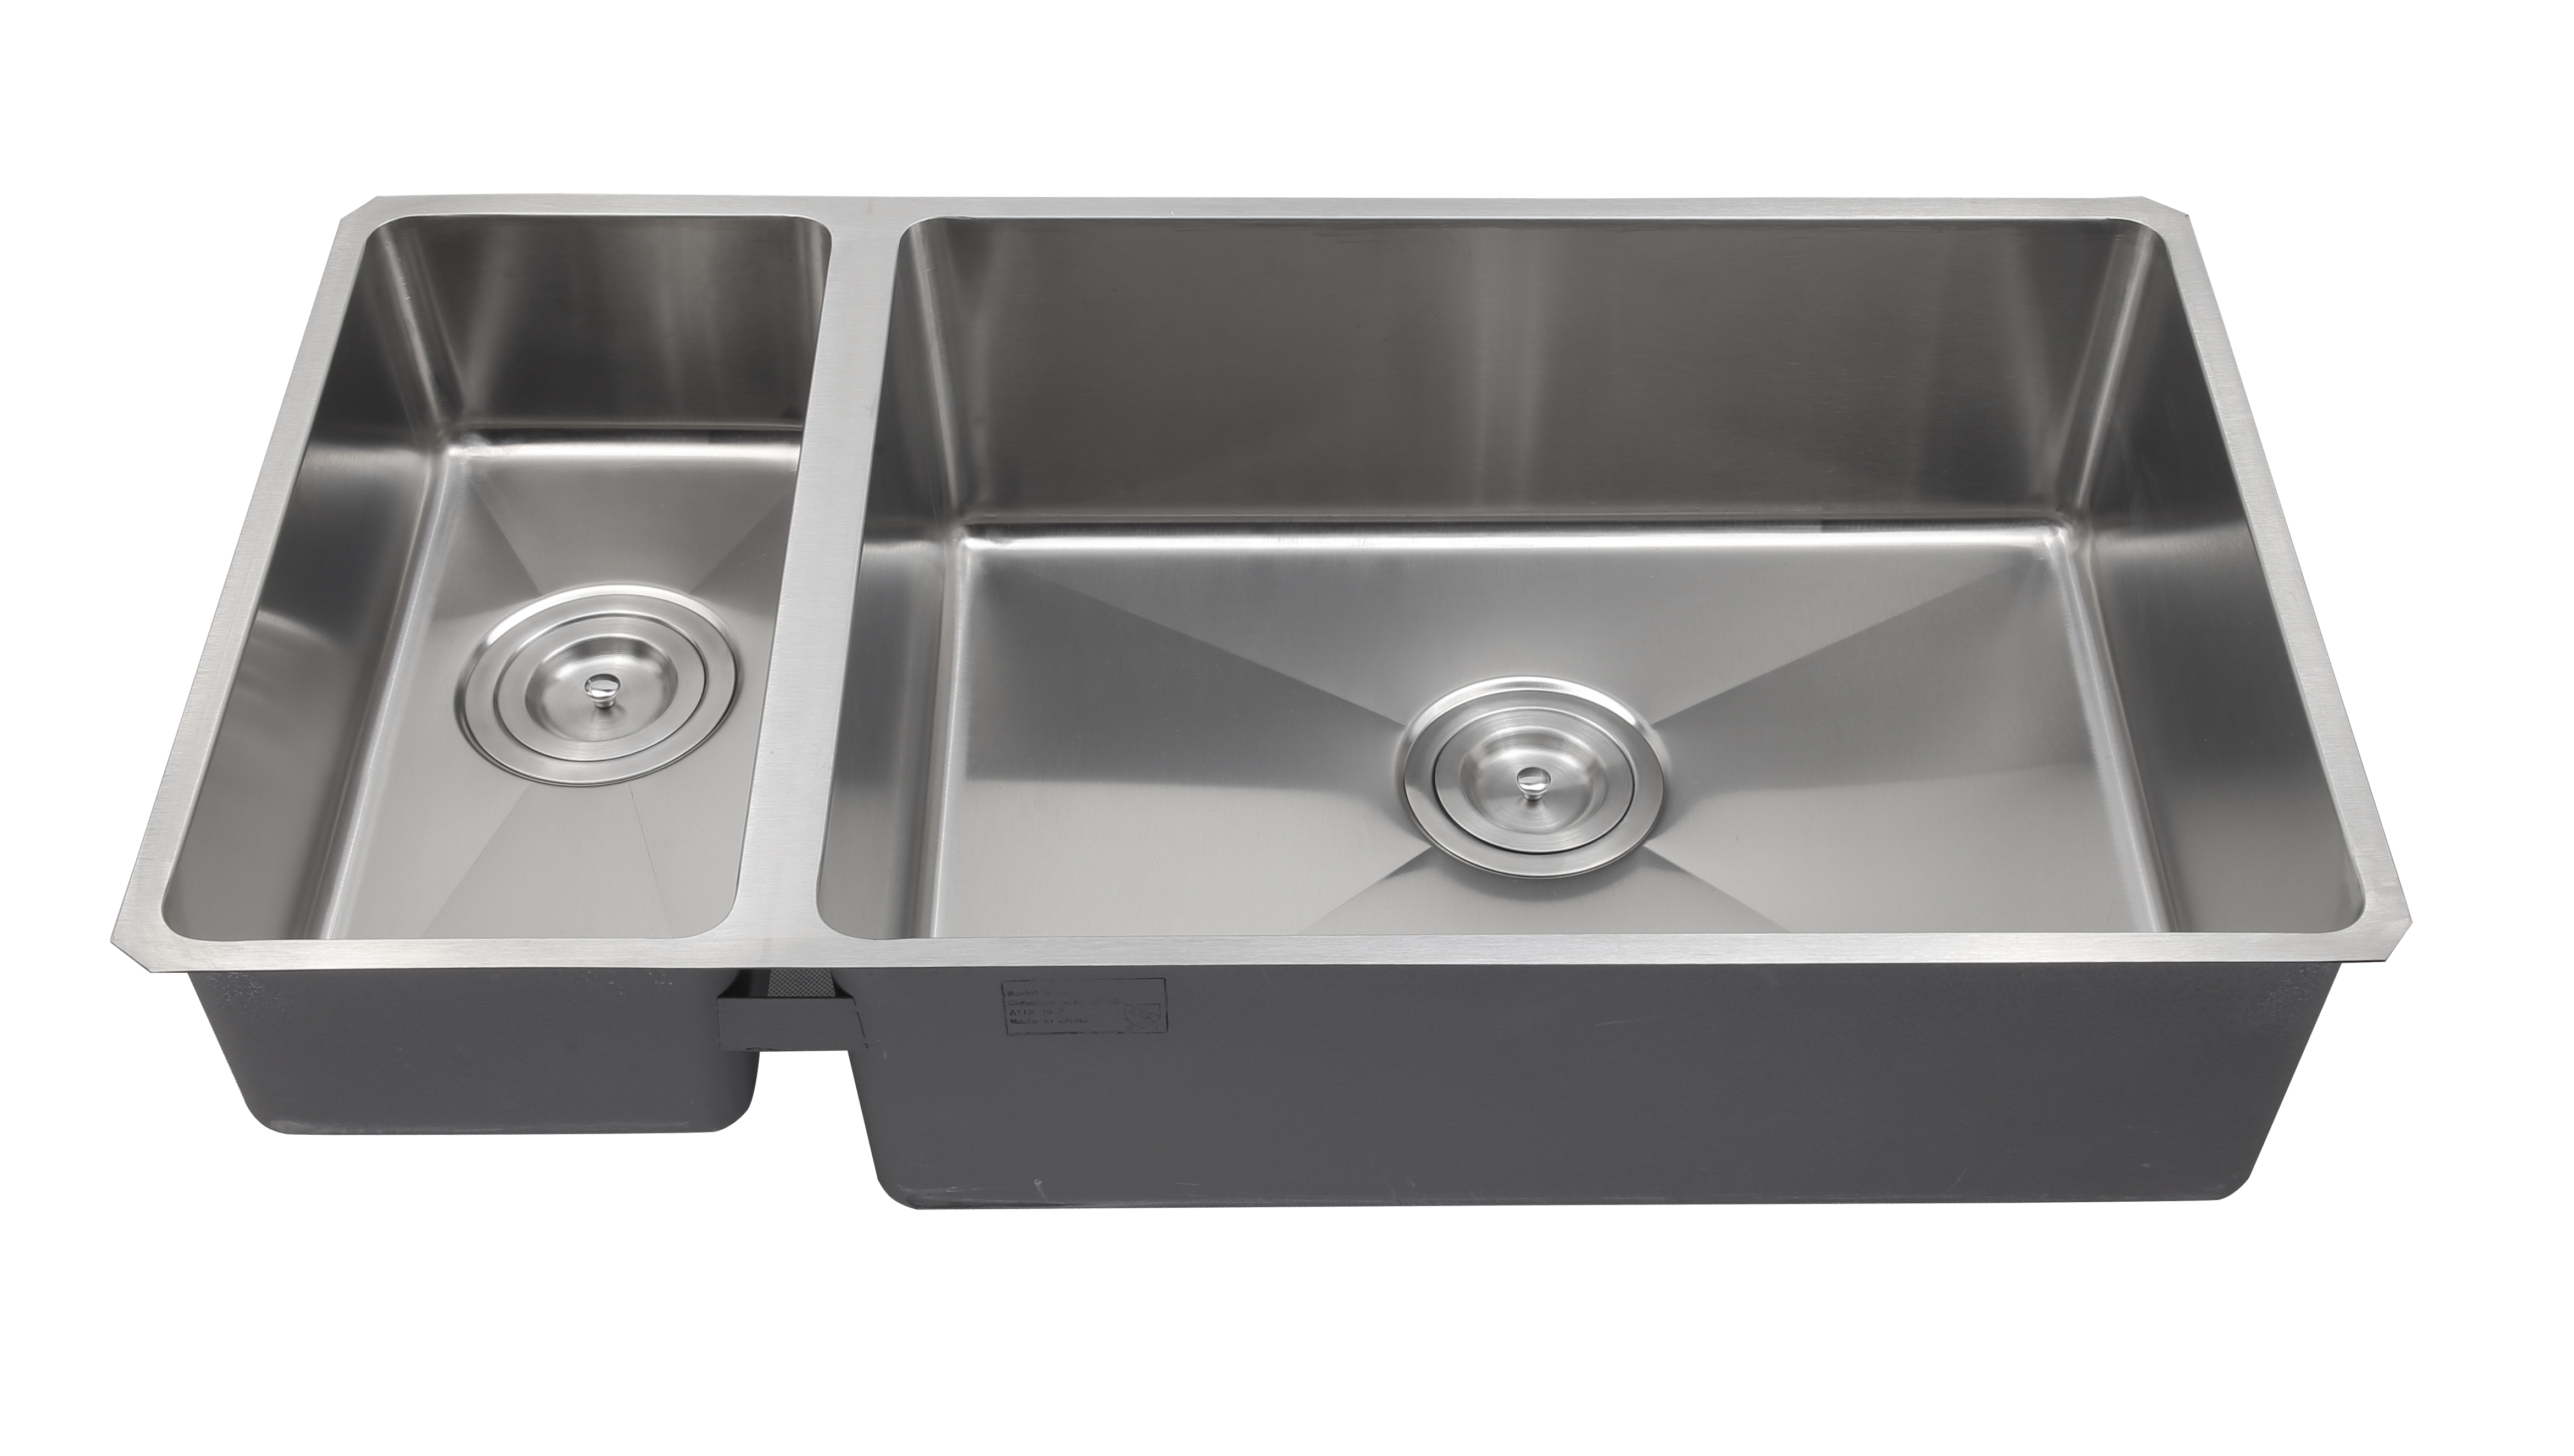 Elegance Undermount Granite Composite Double Bowl Kitchen Sink Reviews